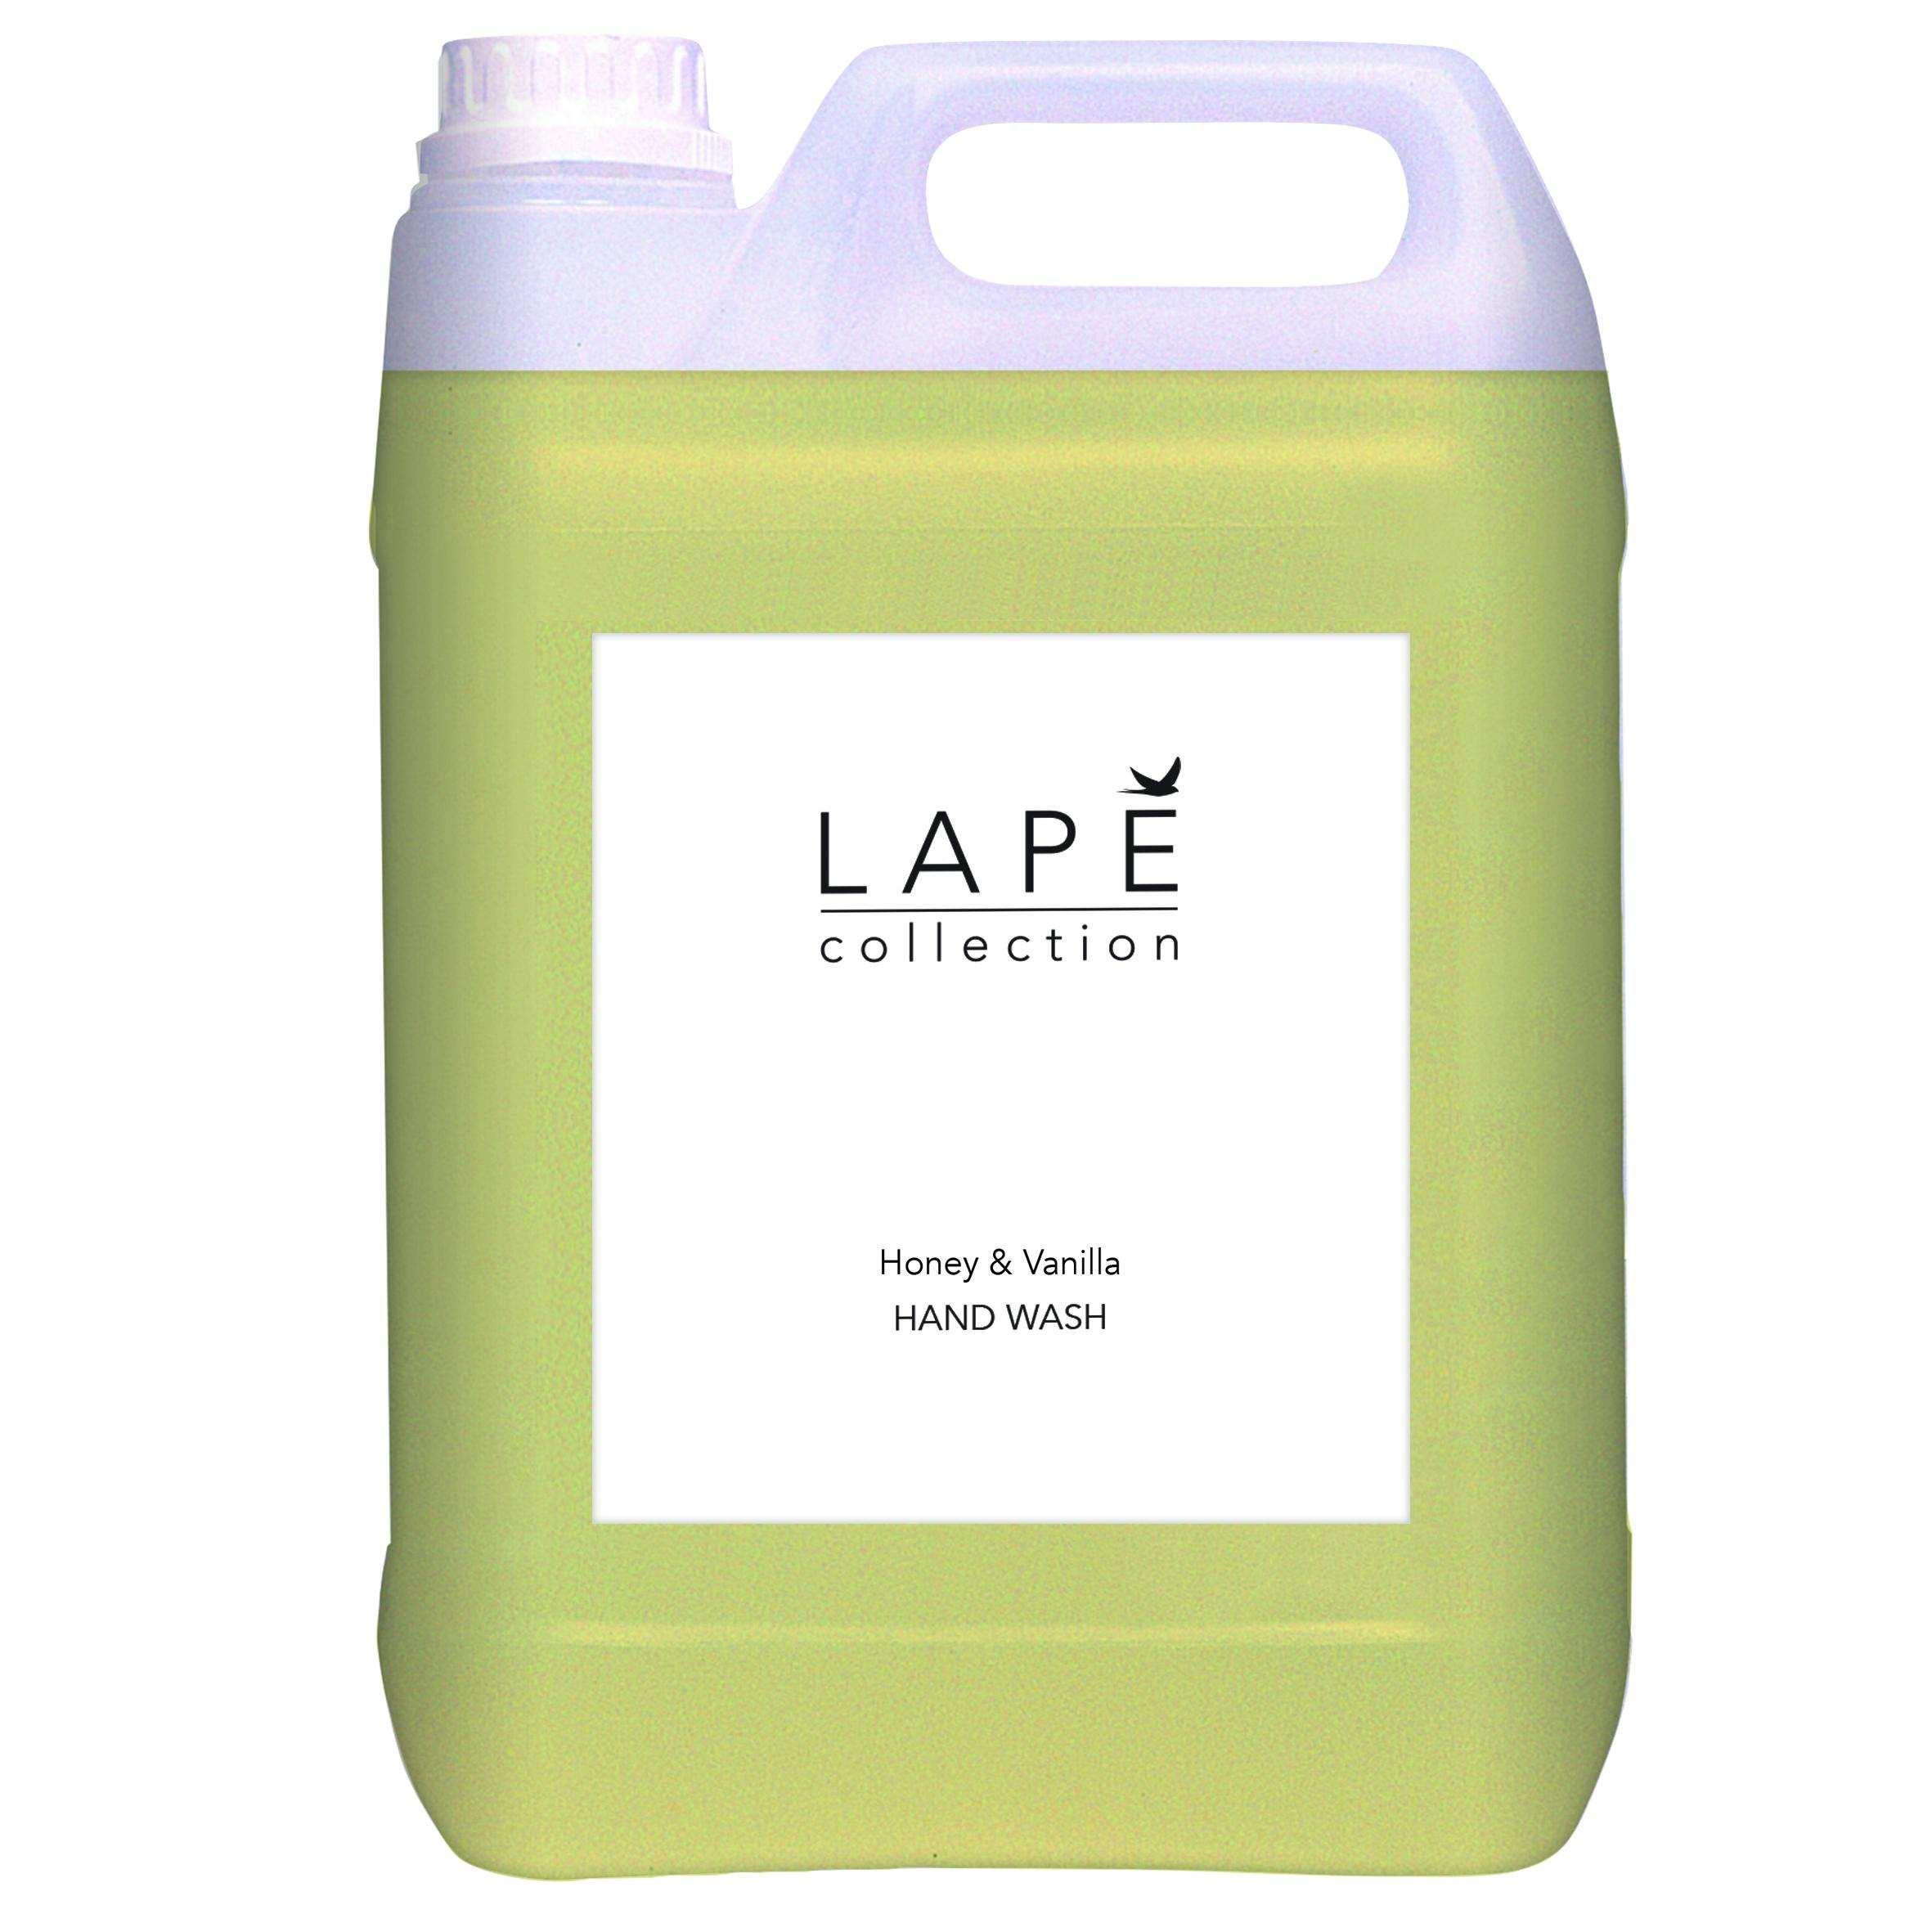 100934577-LAPĒ-Collection-5L-refill-Honey-vanilla-hand-Wash-pack-shot-CMKY-20x20cm.jpg